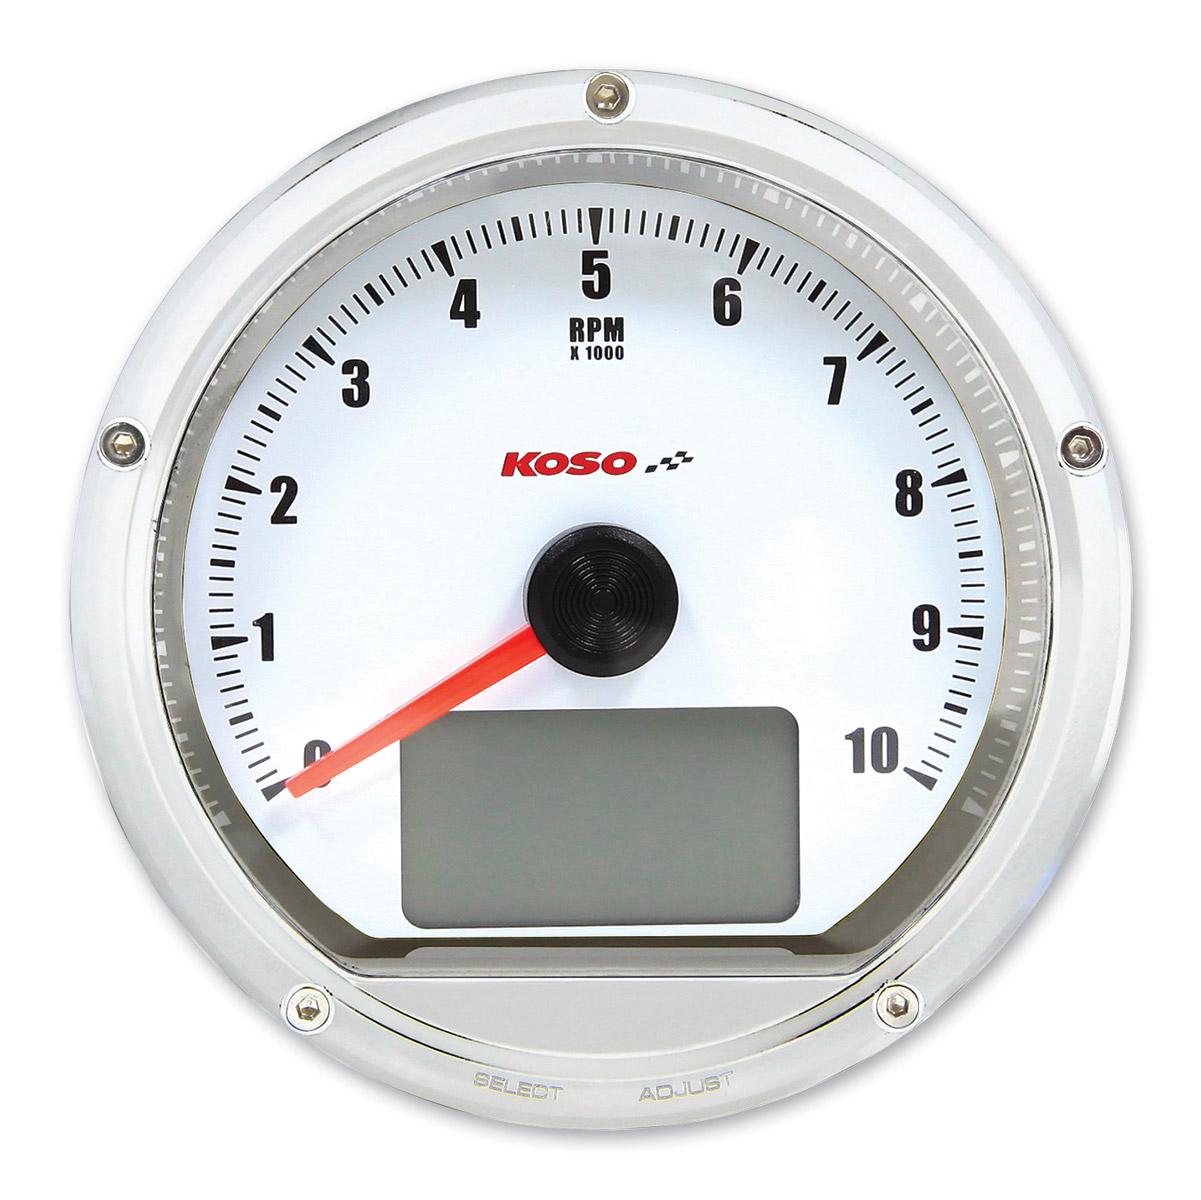 Koso T&T Electronic Speedometer/Techometer